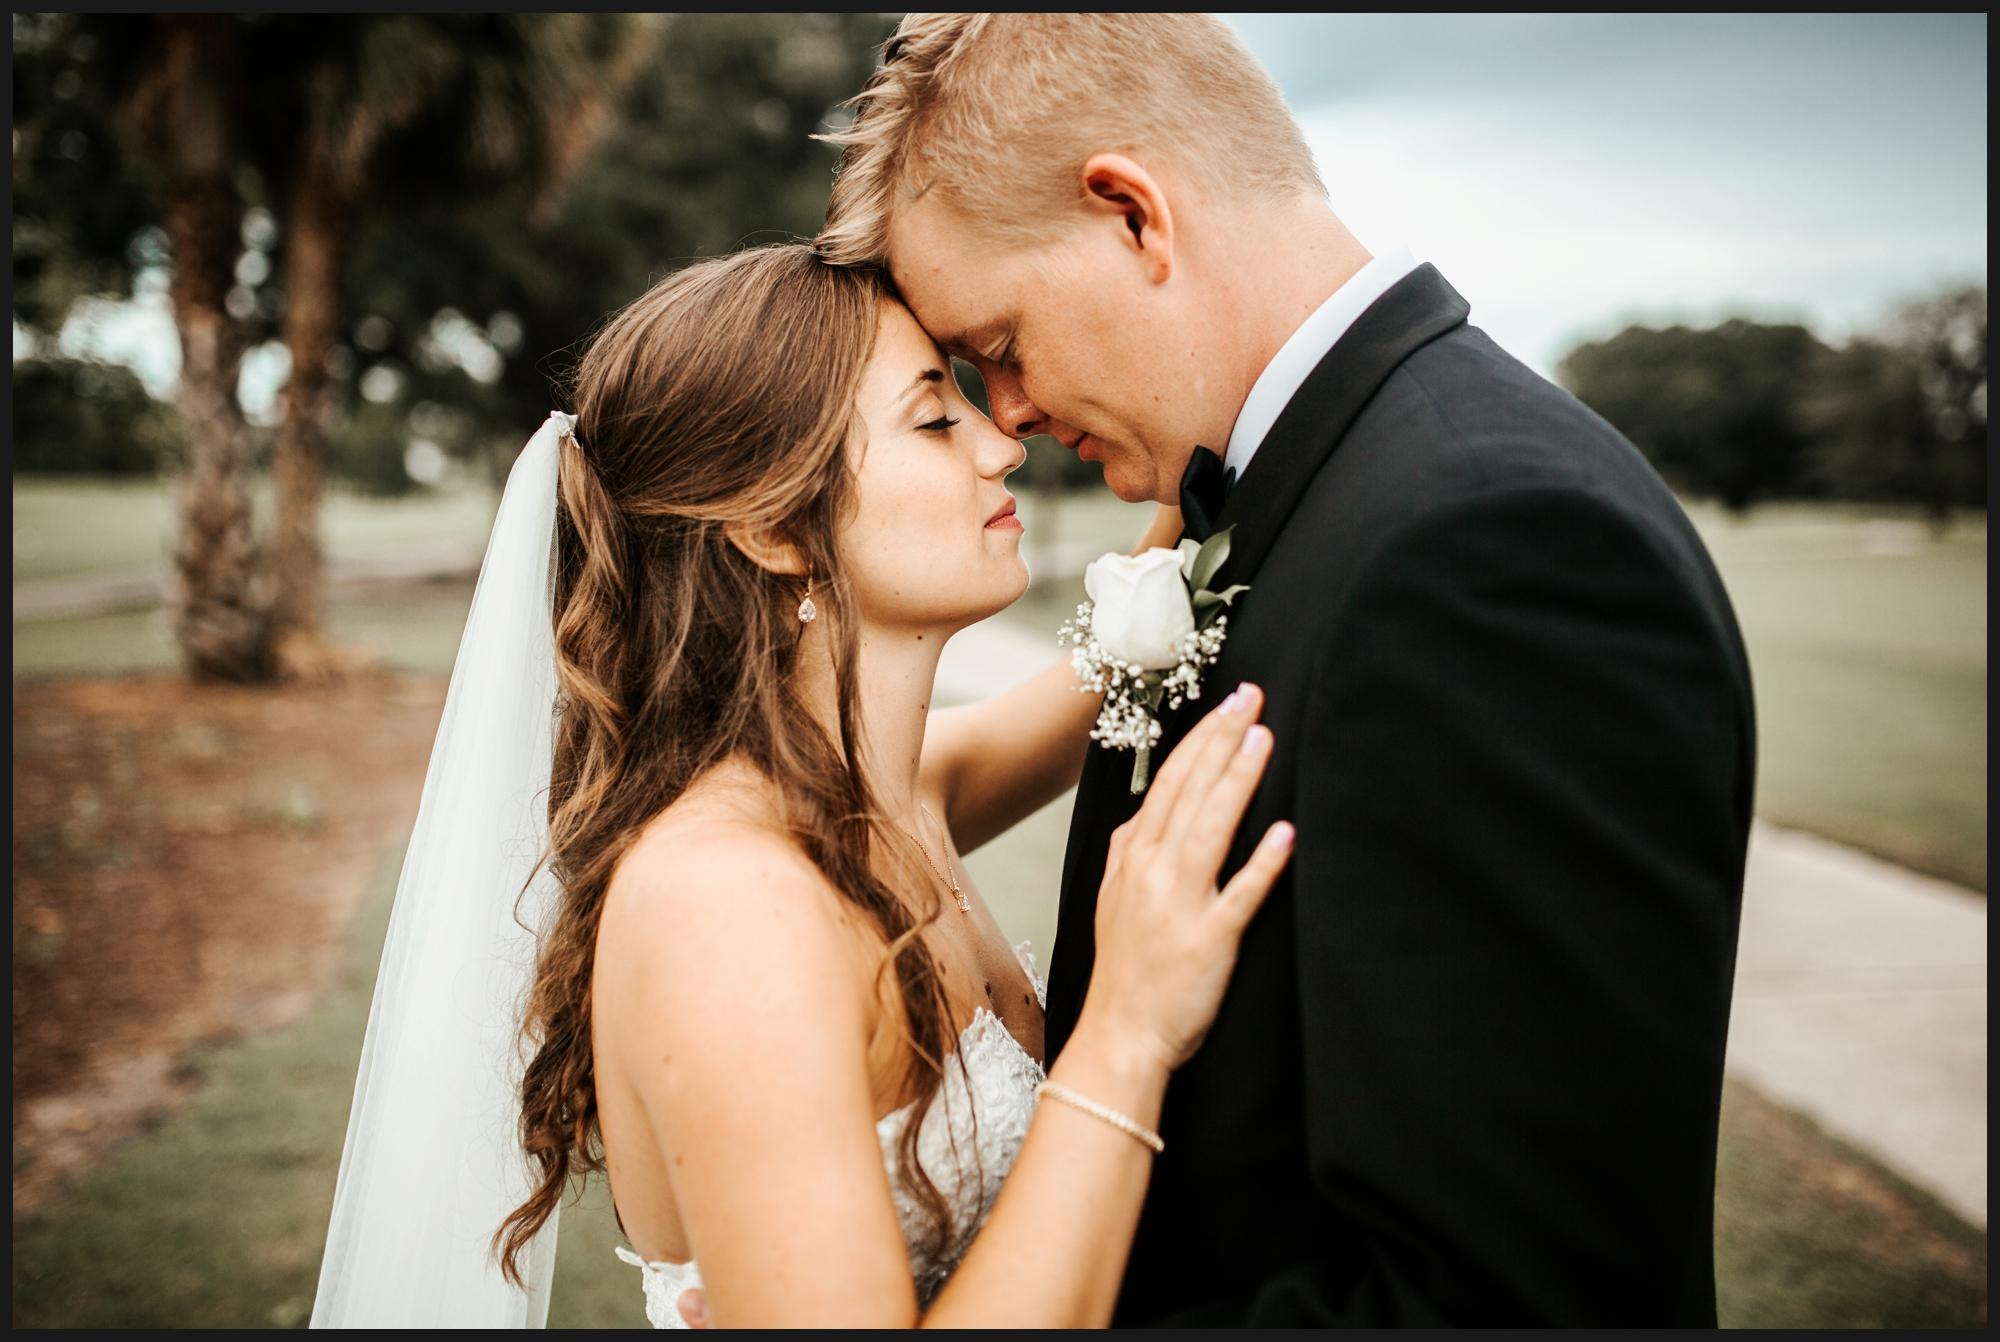 Orlando-Wedding-Photographer-destination-wedding-photographer-florida-wedding-photographer-bohemian-wedding-photographer_0076.jpg